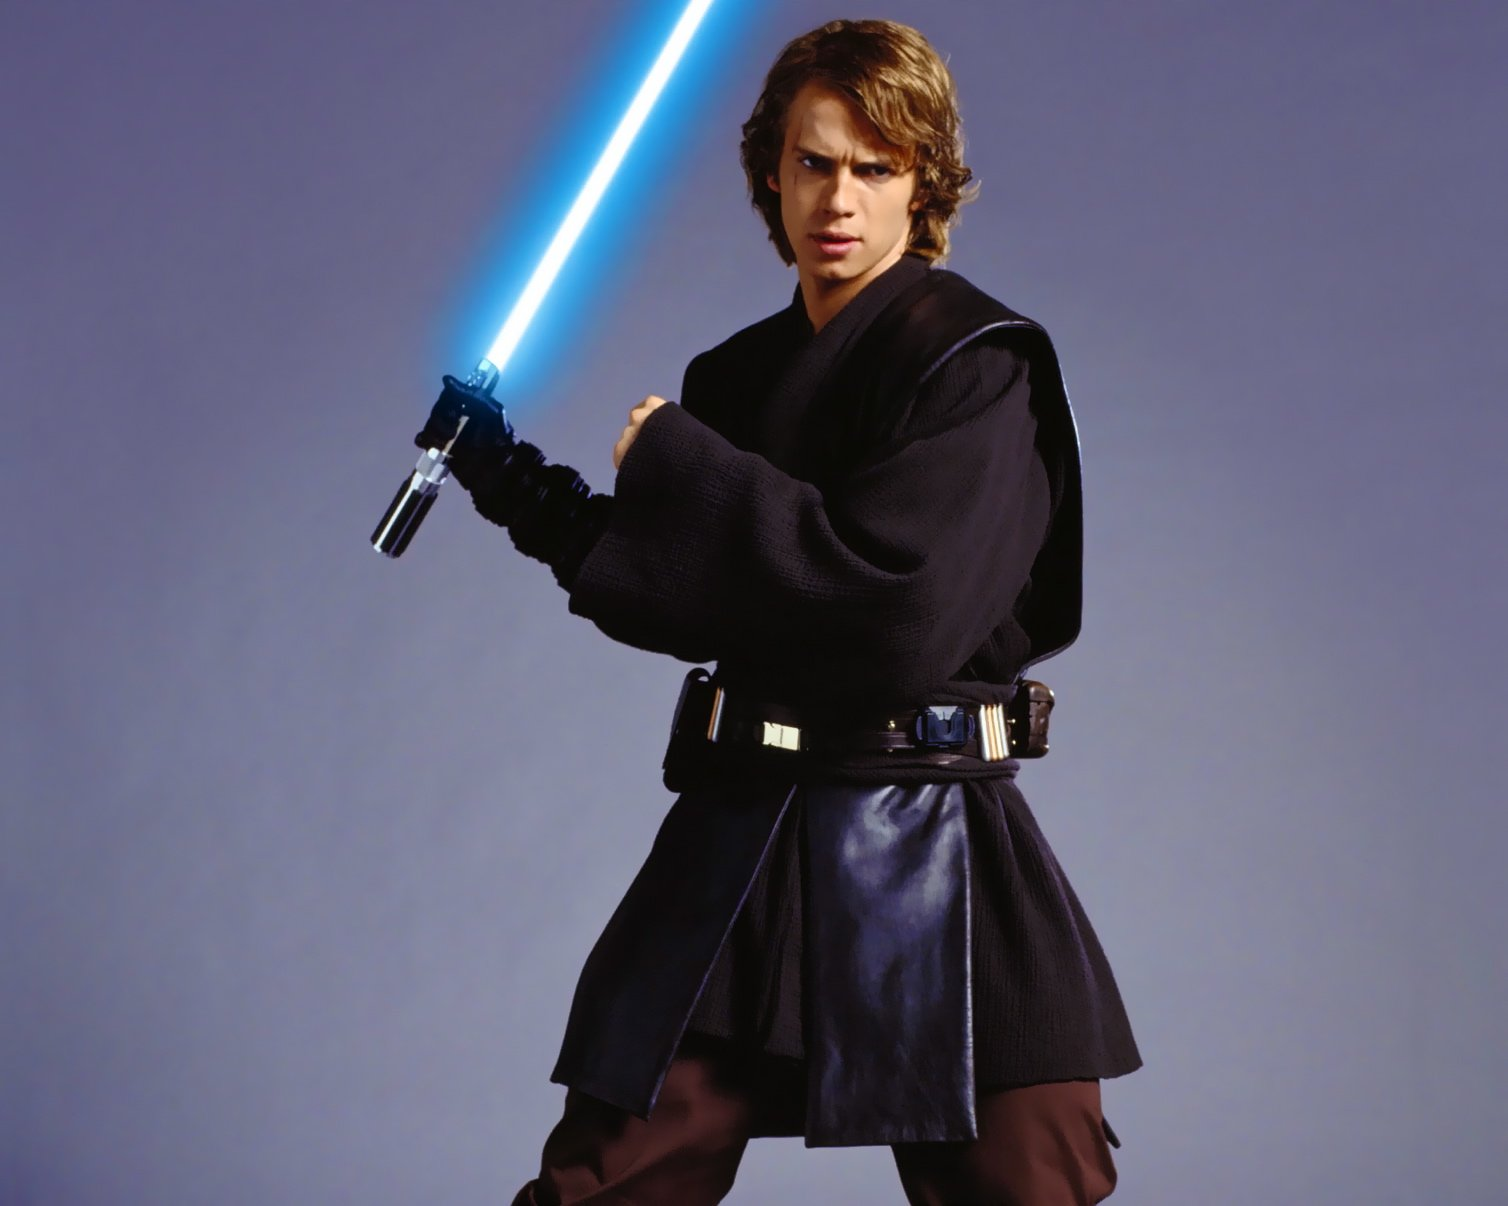 Anakin Skywalker File vettoriale   ForWallpapercom 1508x1206